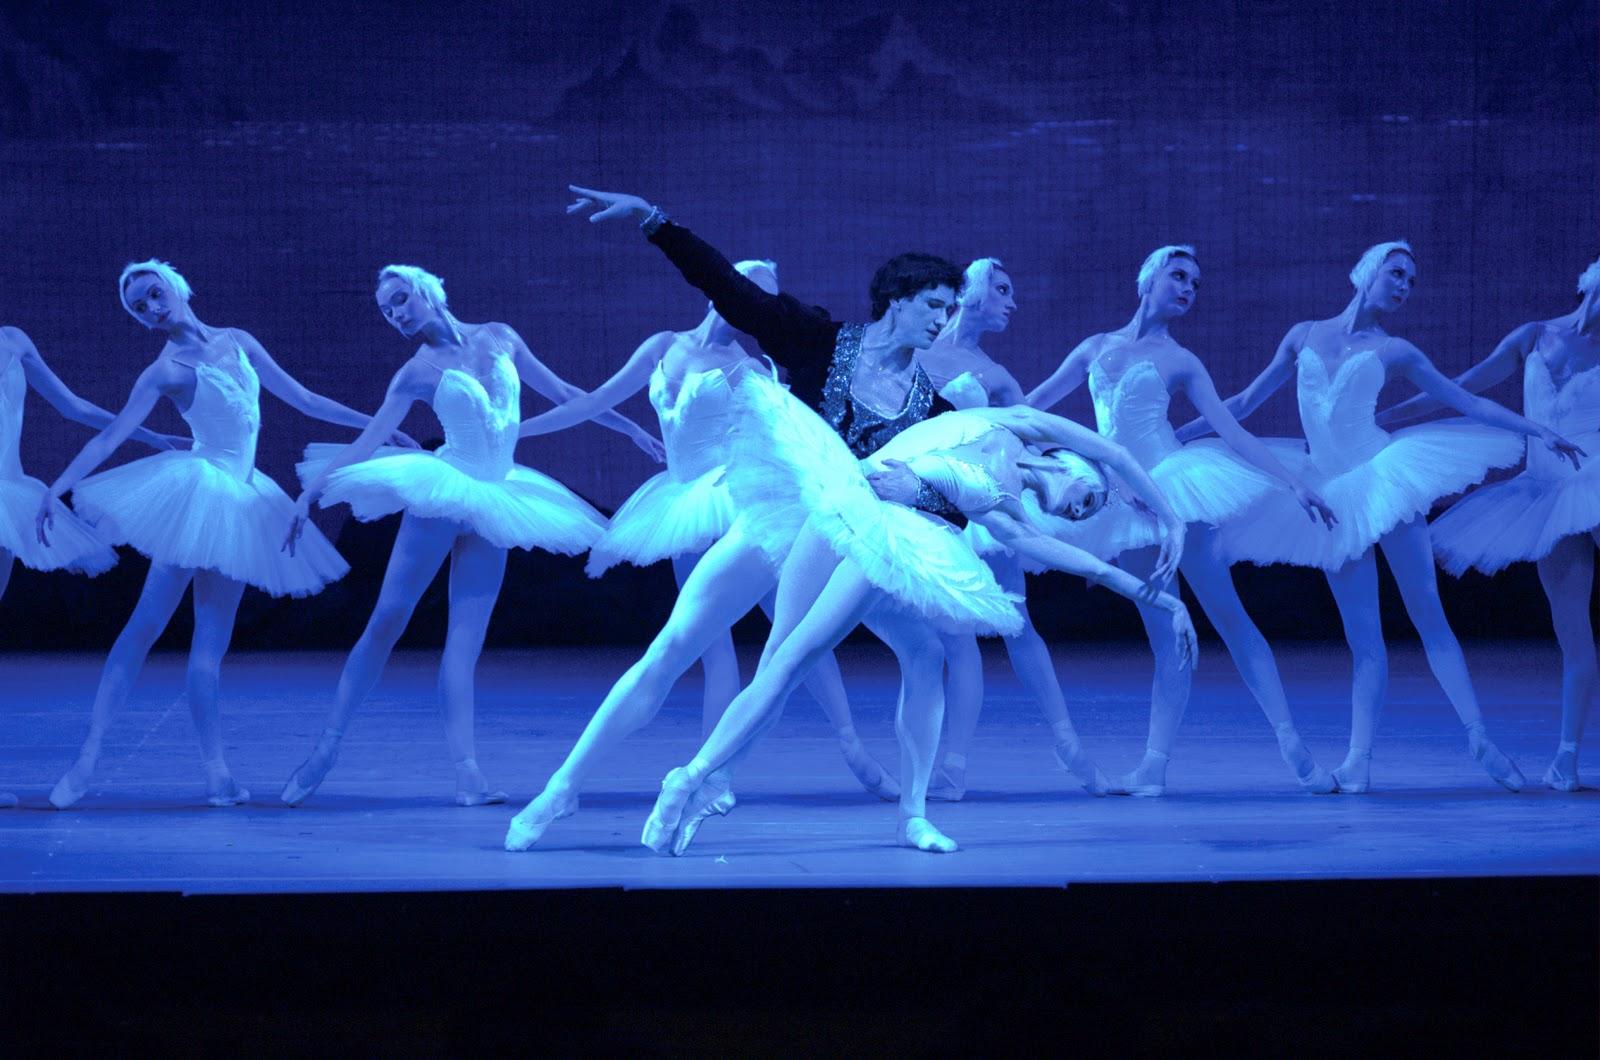 Alanis Cumlouder Argentina Porno renowned mariinsky ballet visits toronto's sony centre mar 1-6